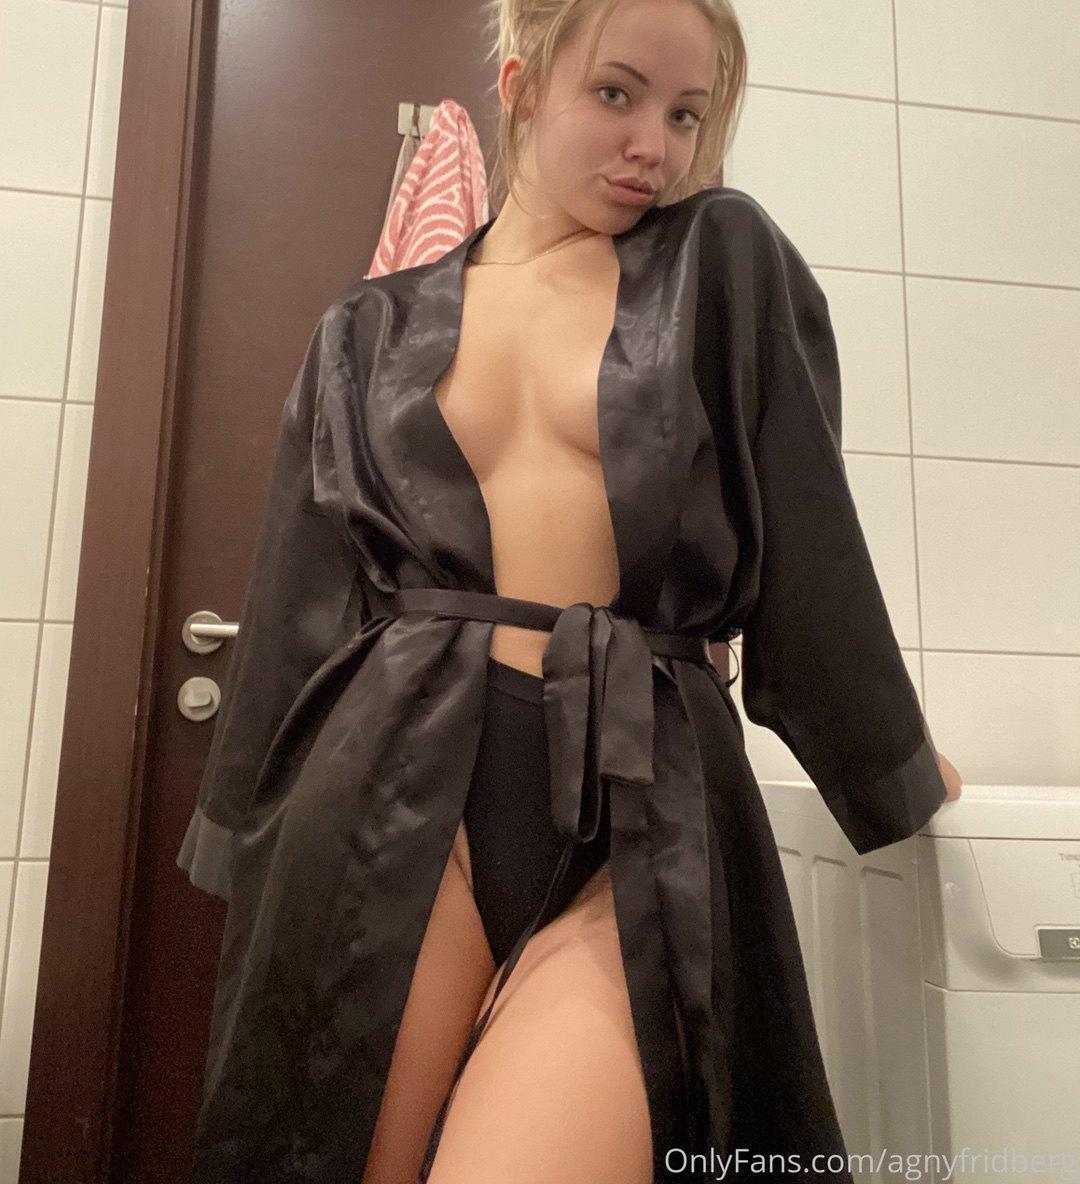 Agnyf Agnyfridberg Onlyfans Nudes Leaks 0024